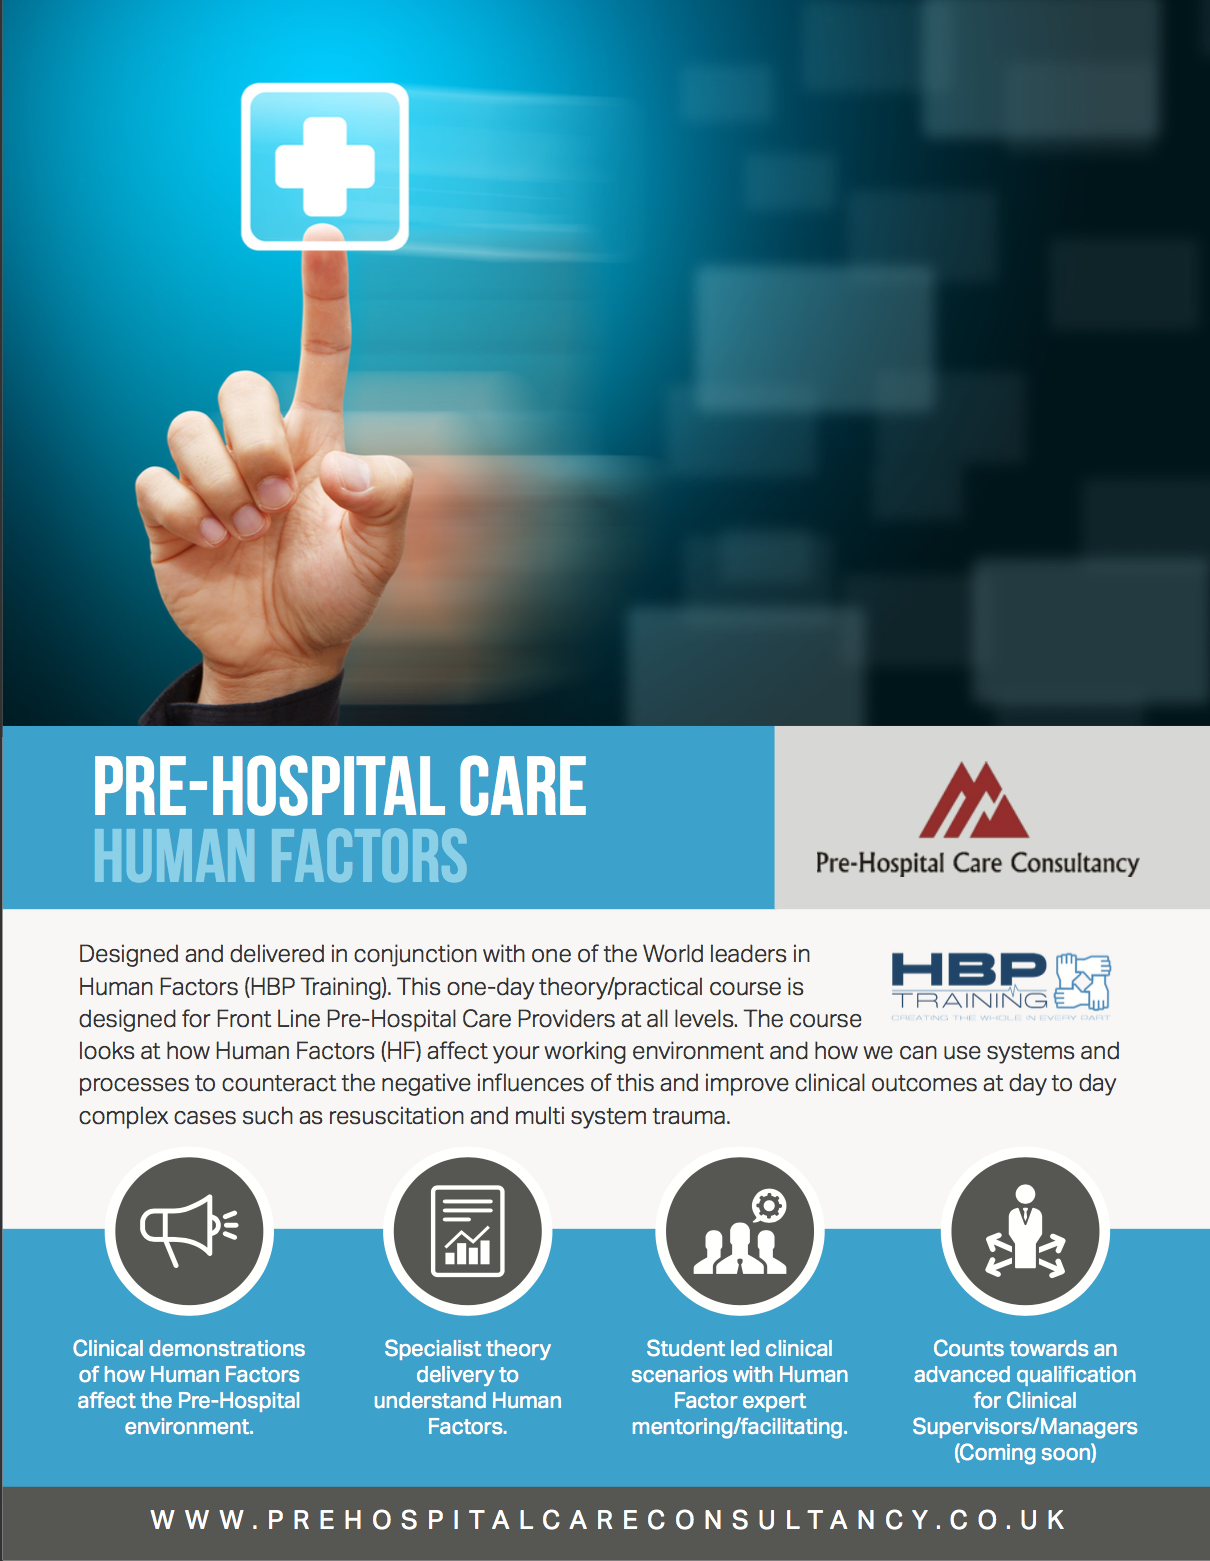 Pre-Hospital-Care-Human-factors-course-information